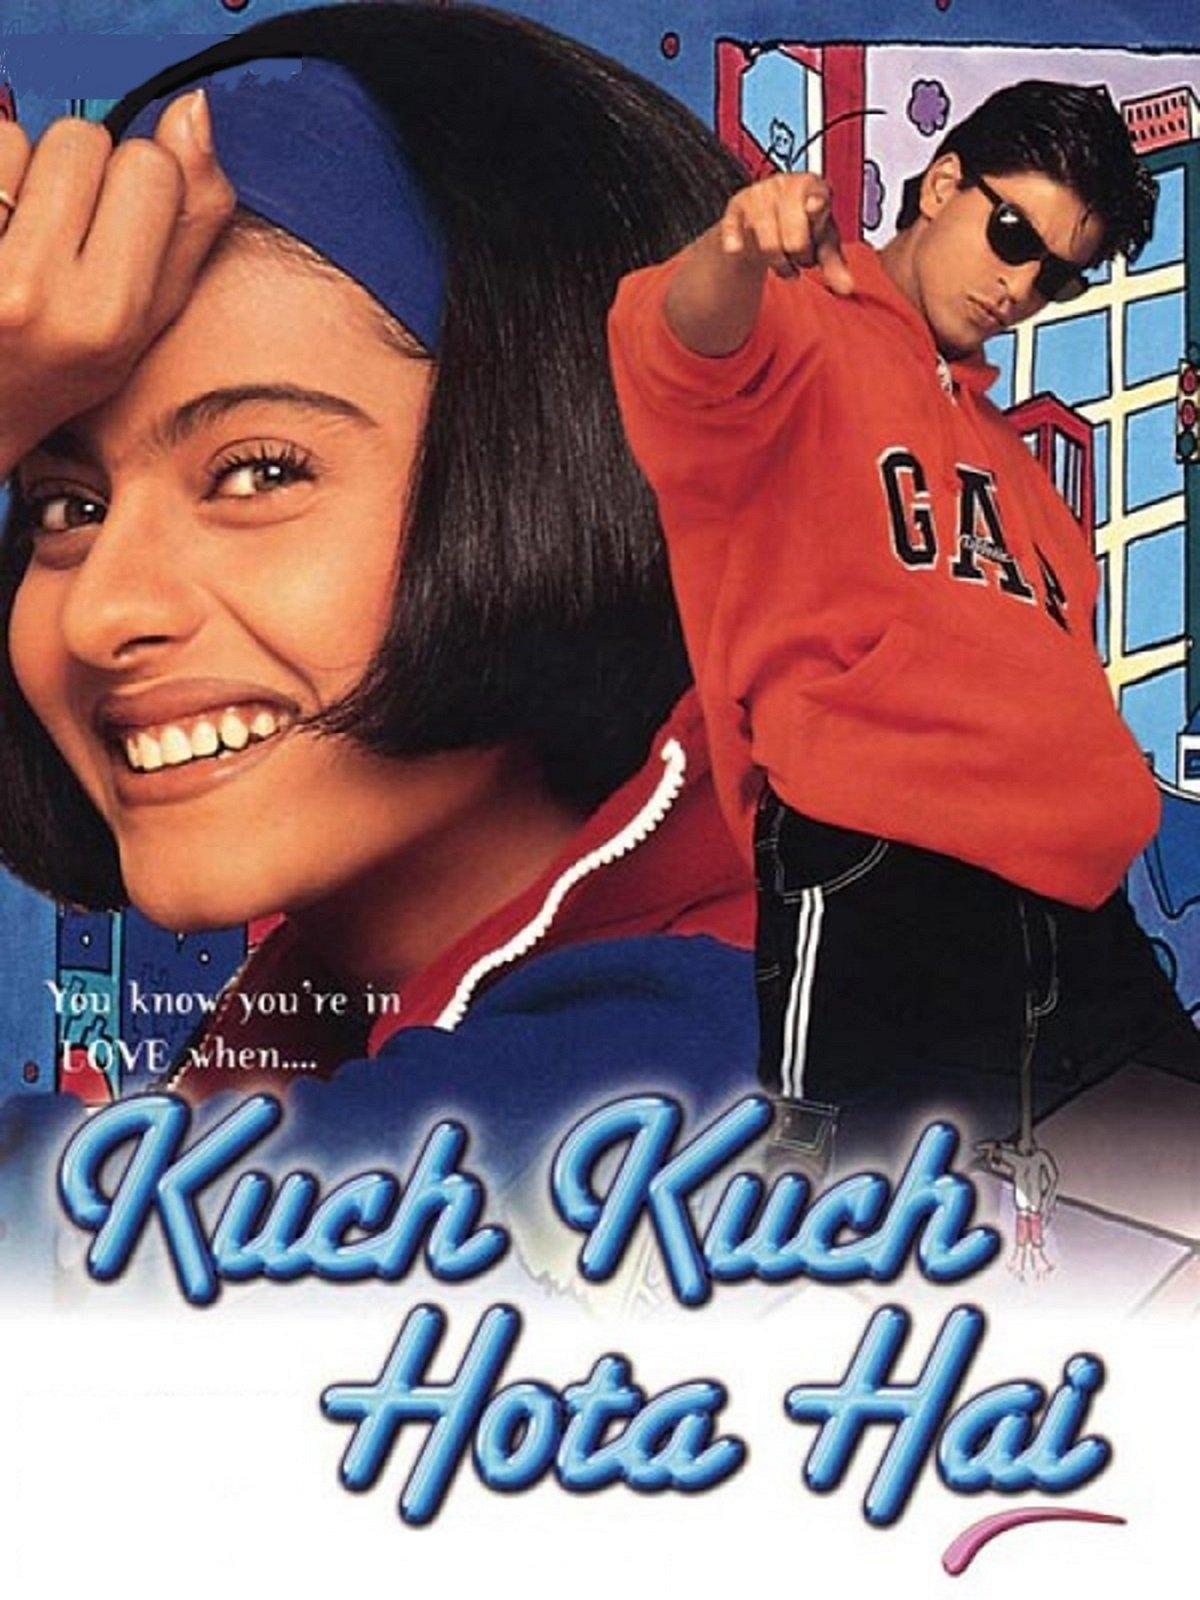 download kuch kuch hota hai full movie with english subtitles